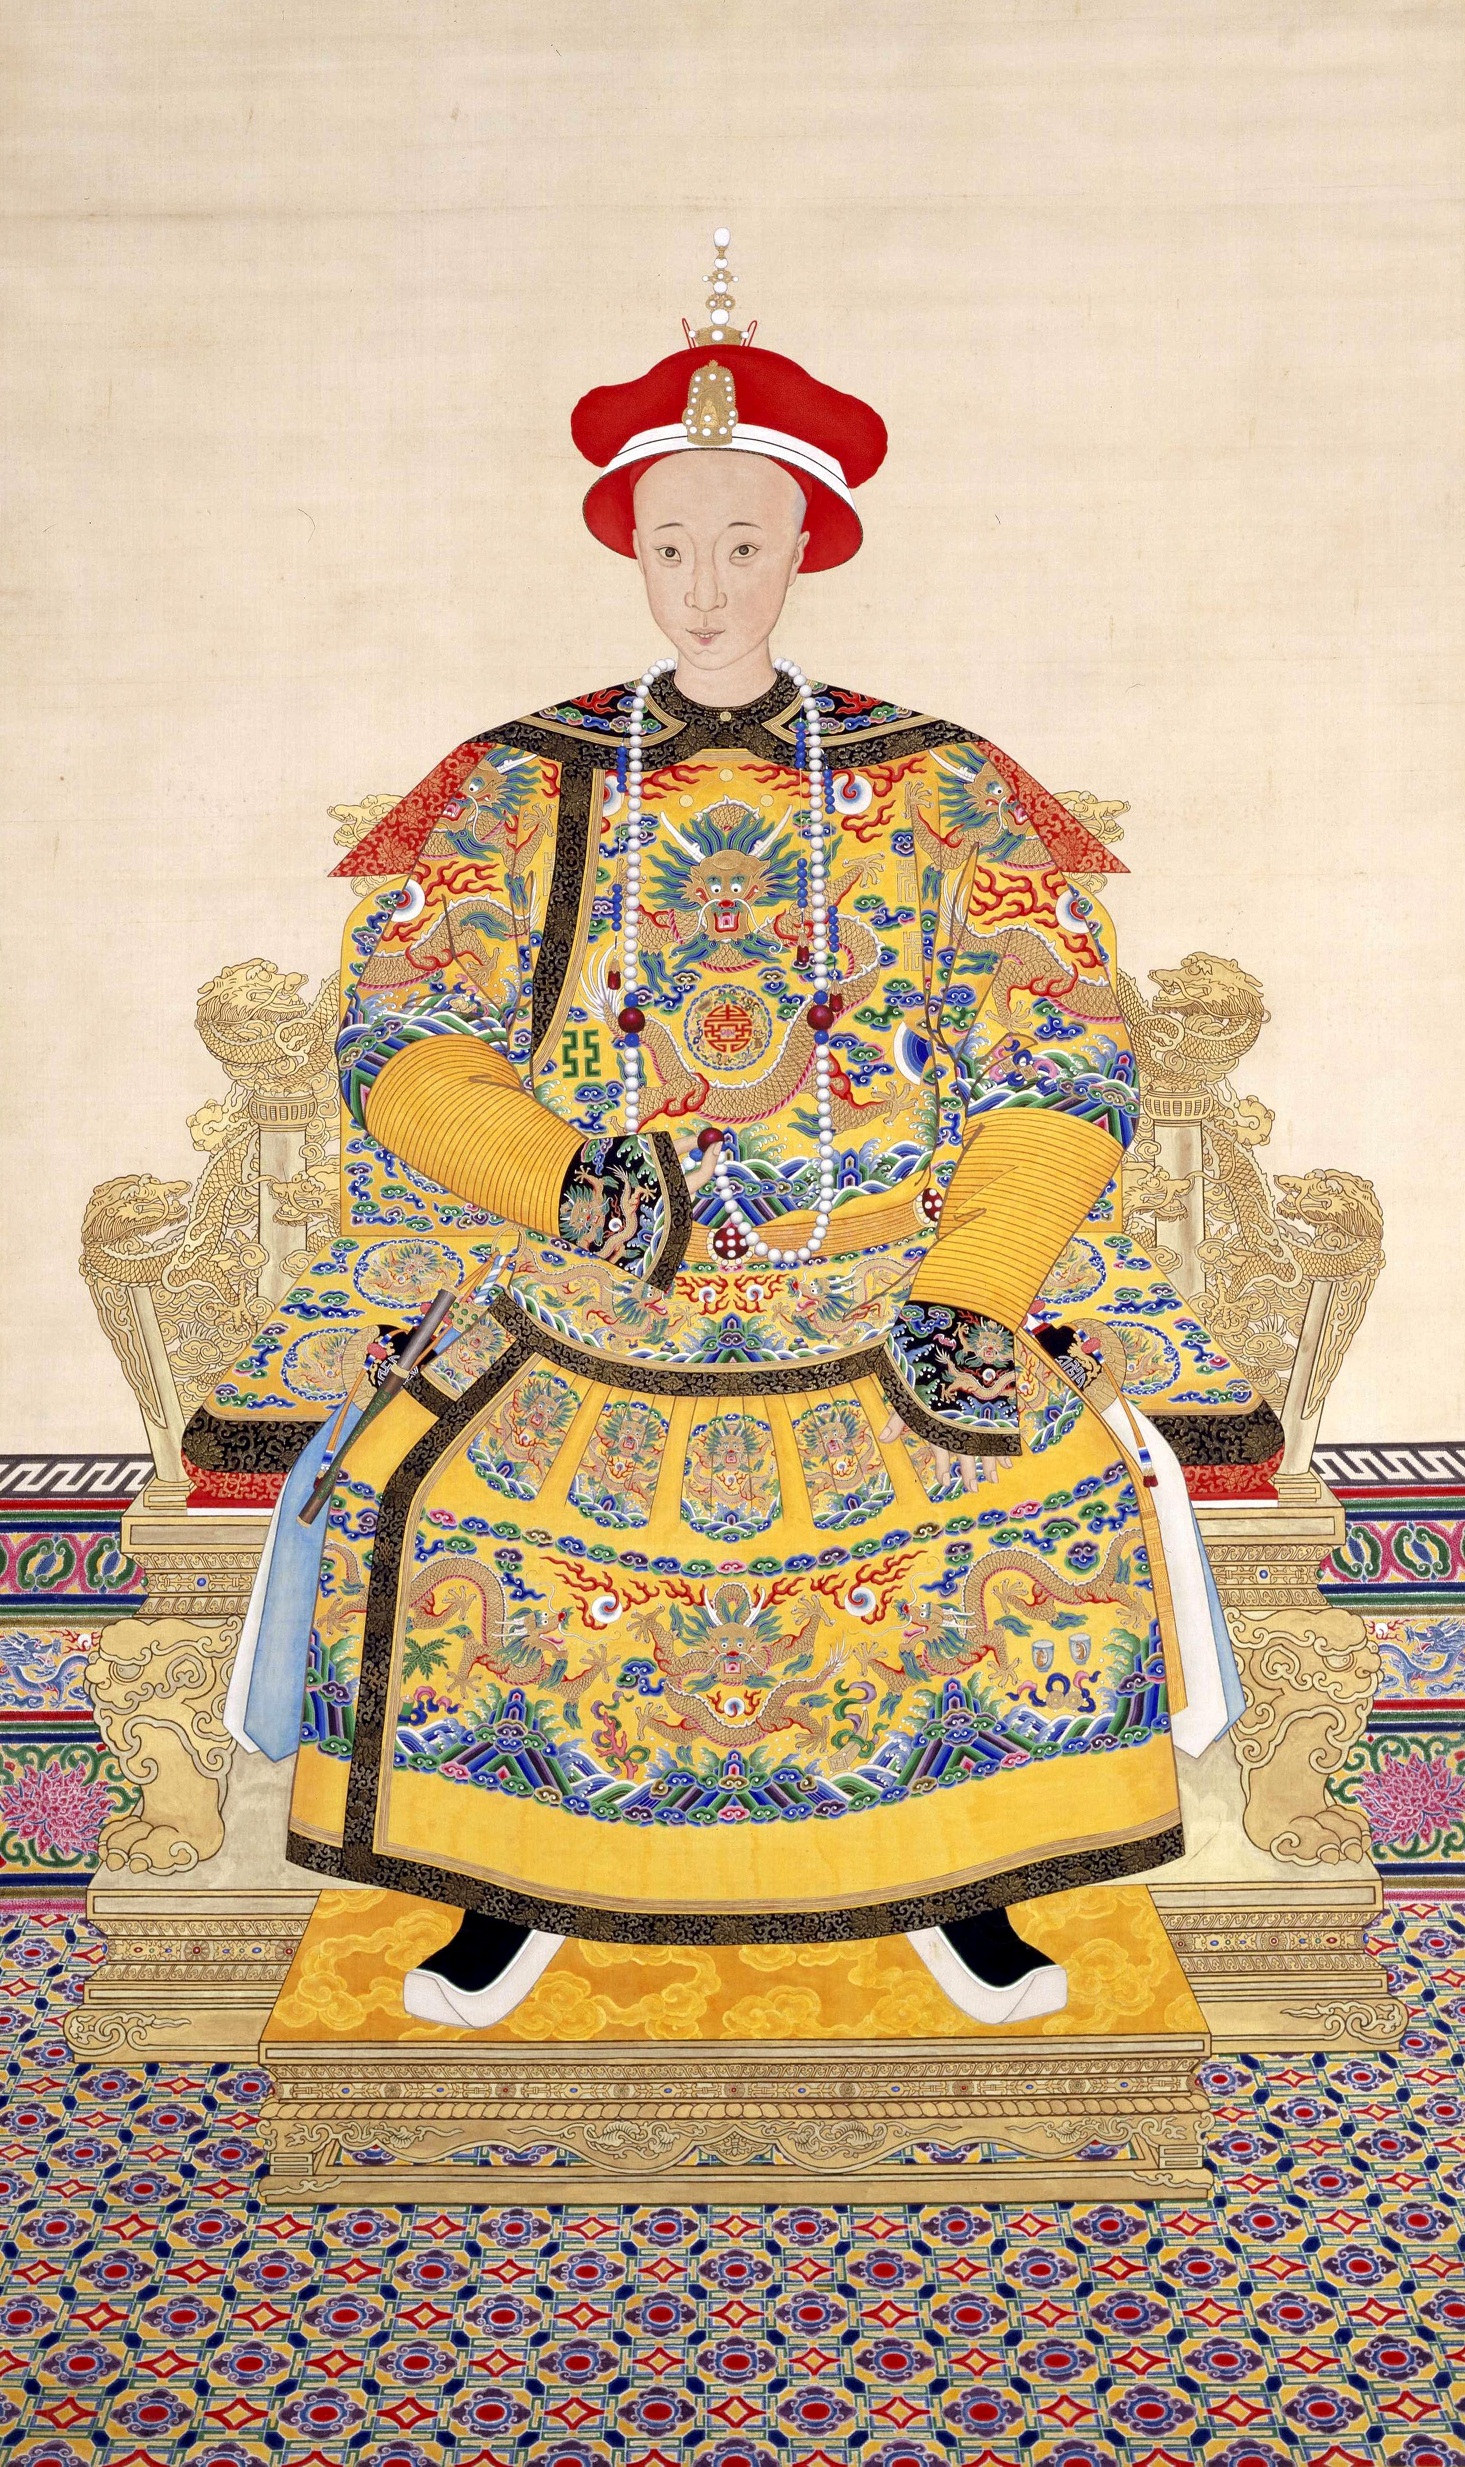 Tongzhi Emperor